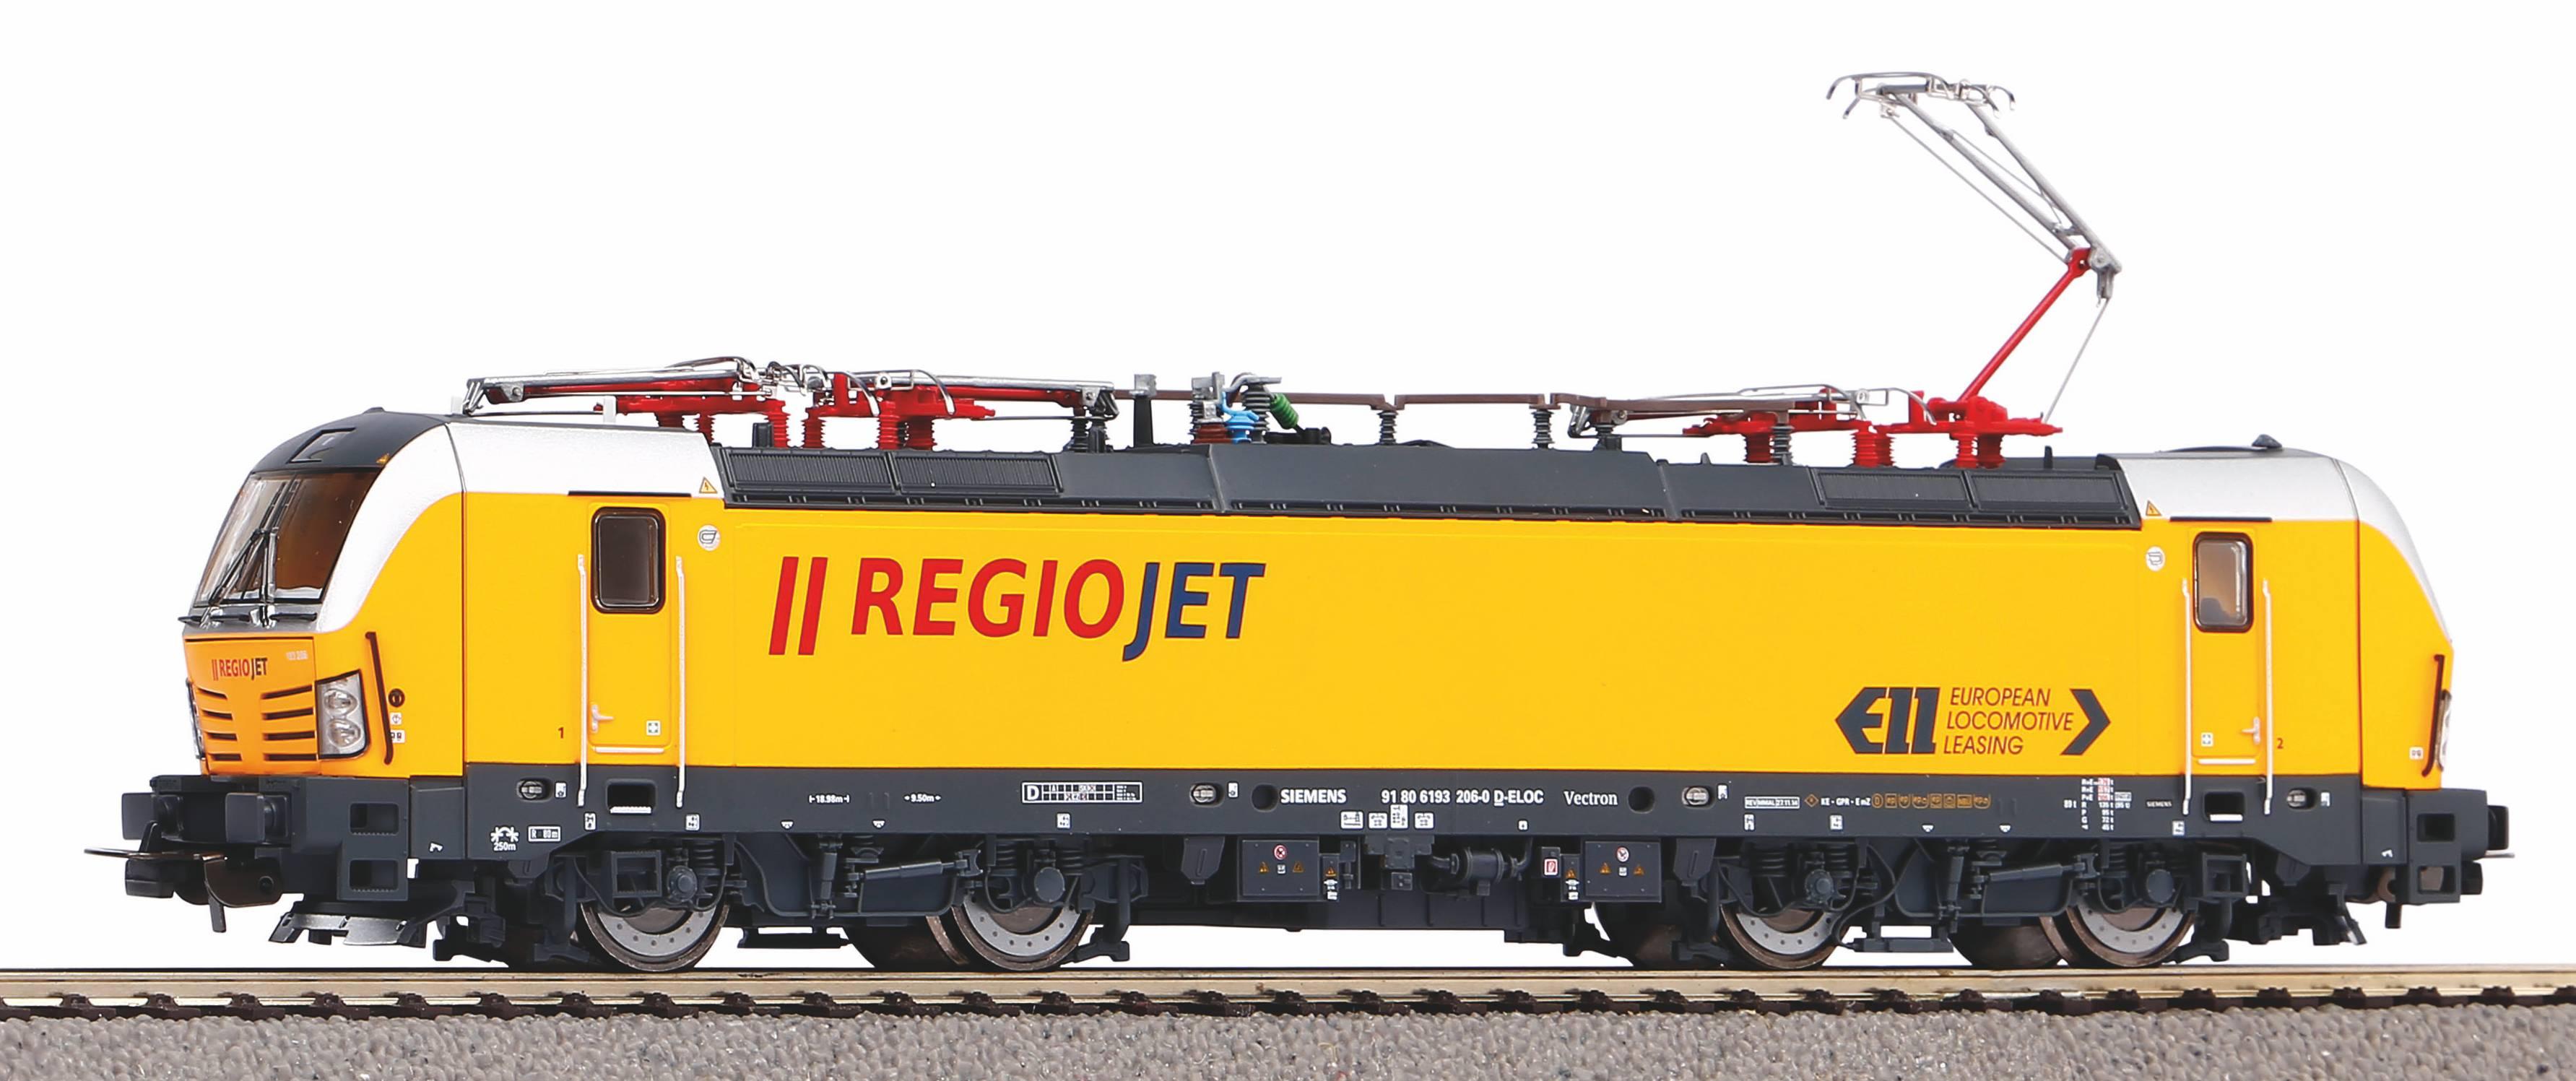 Piko Elektrická lokomotiva Vectron s 4 pantografy Regiojet VI - 59591